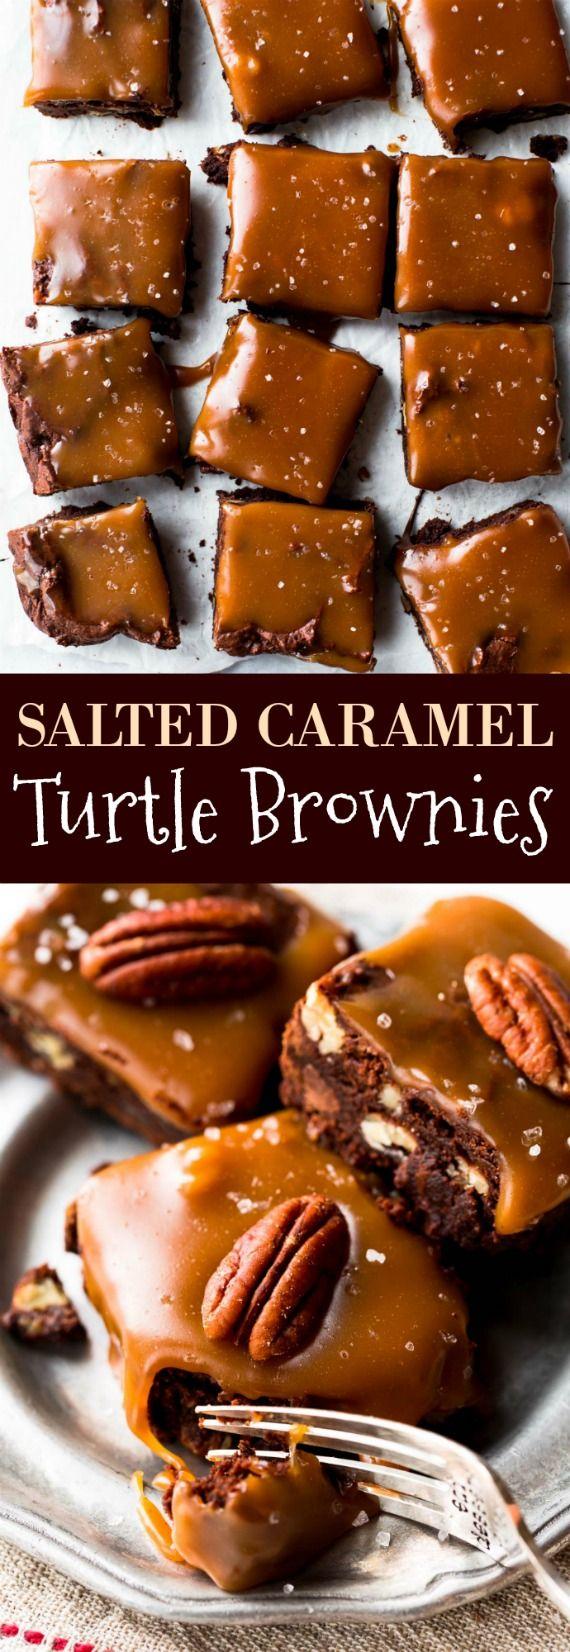 How to make salted caramel turtle brownies with homemade salted caramel and one bowl brownies!! Recipe on sallysbakingaddiction.com